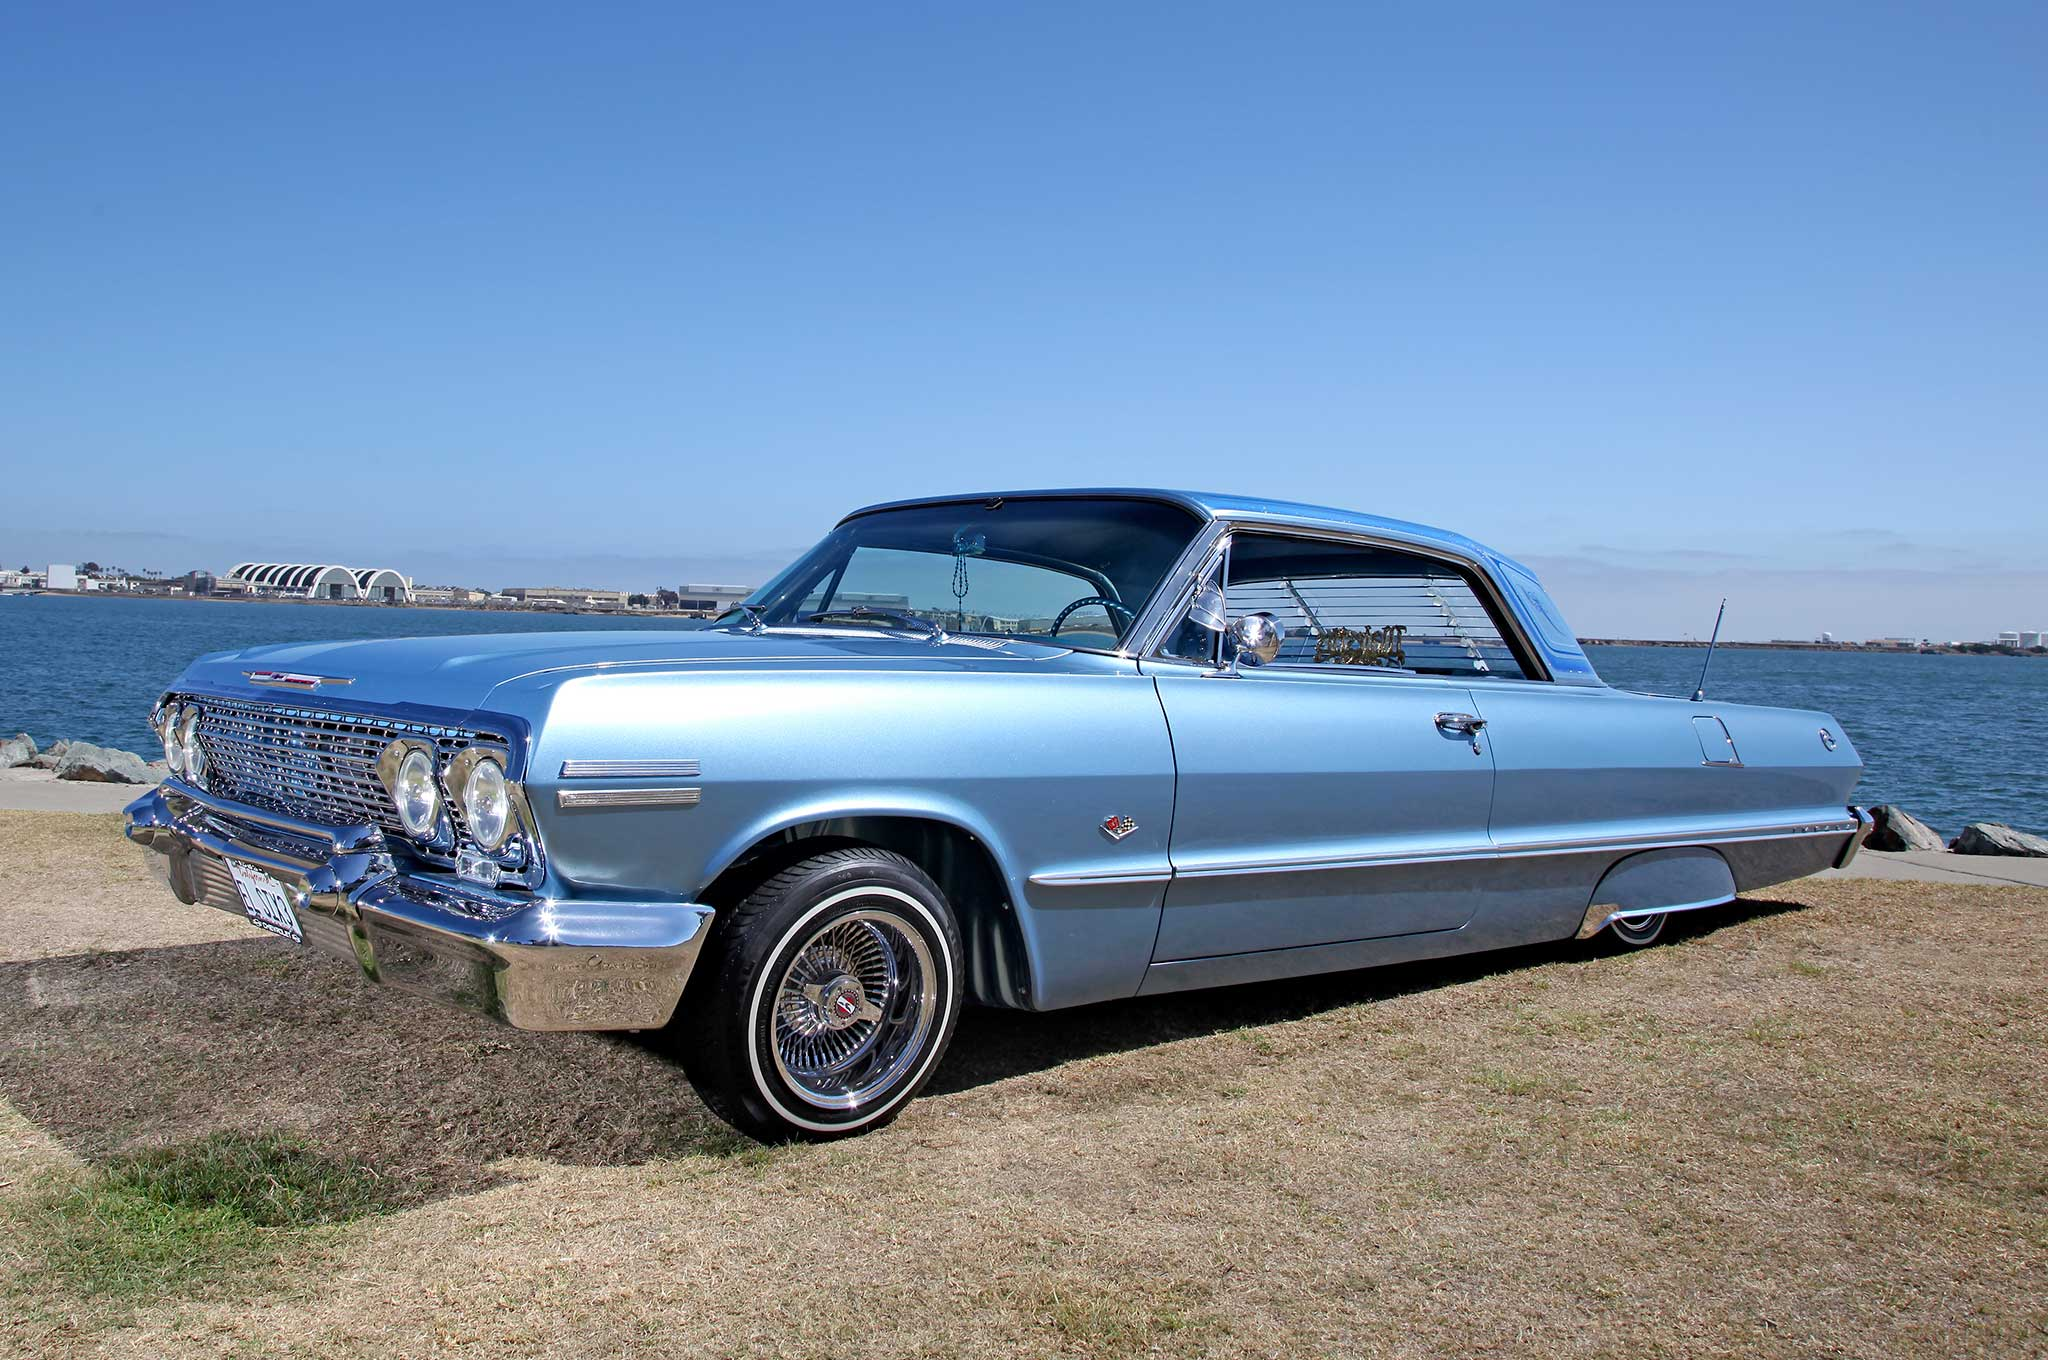 64 impala headlight wiring diagram 1963 impala electrical